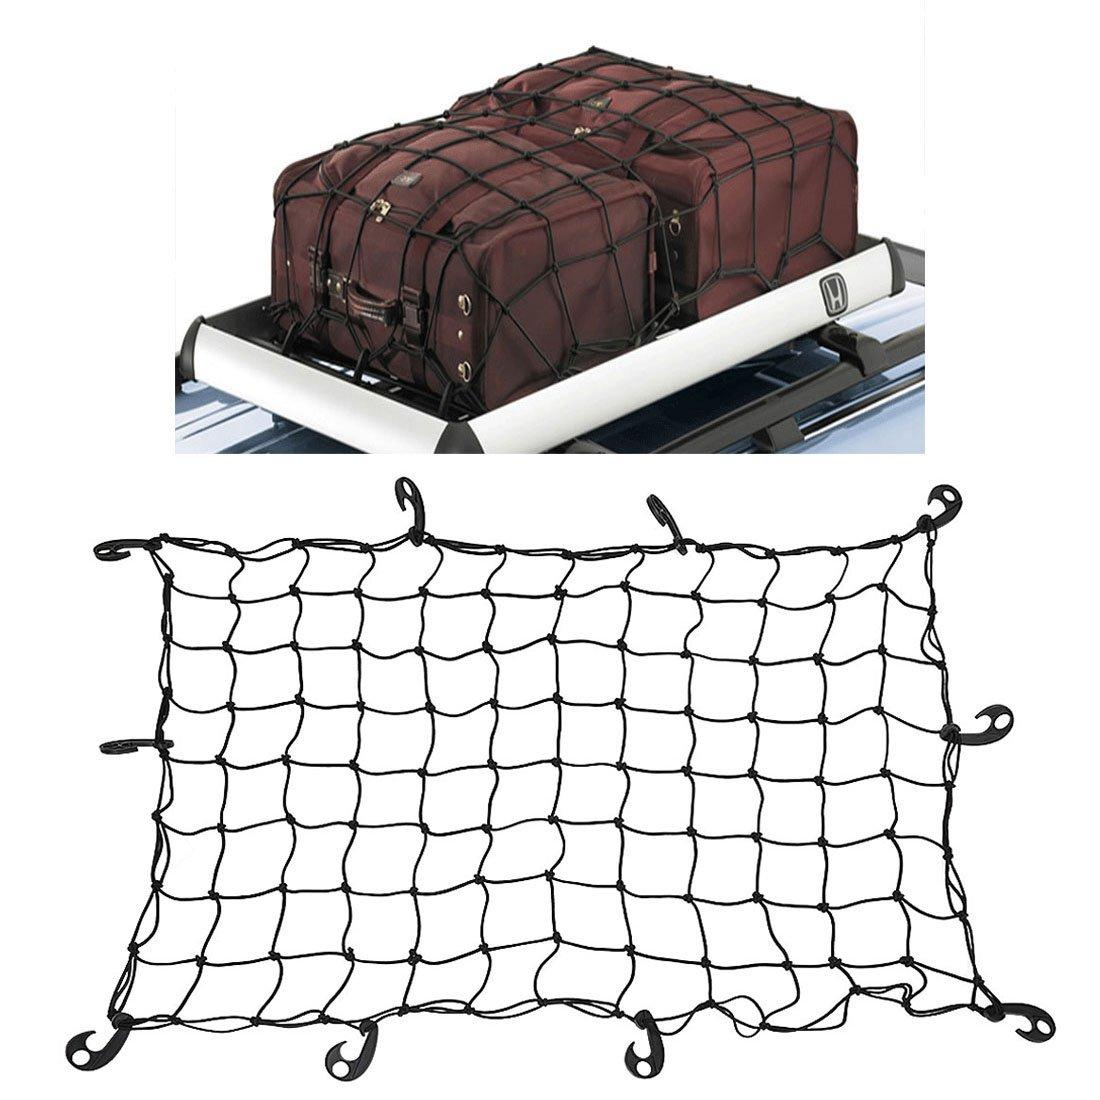 WINOMO Car Storage Net Heavy Duty Stretchable Latex Bungee Cargo Net Roof Netting with 12pcs Plastic Hooks